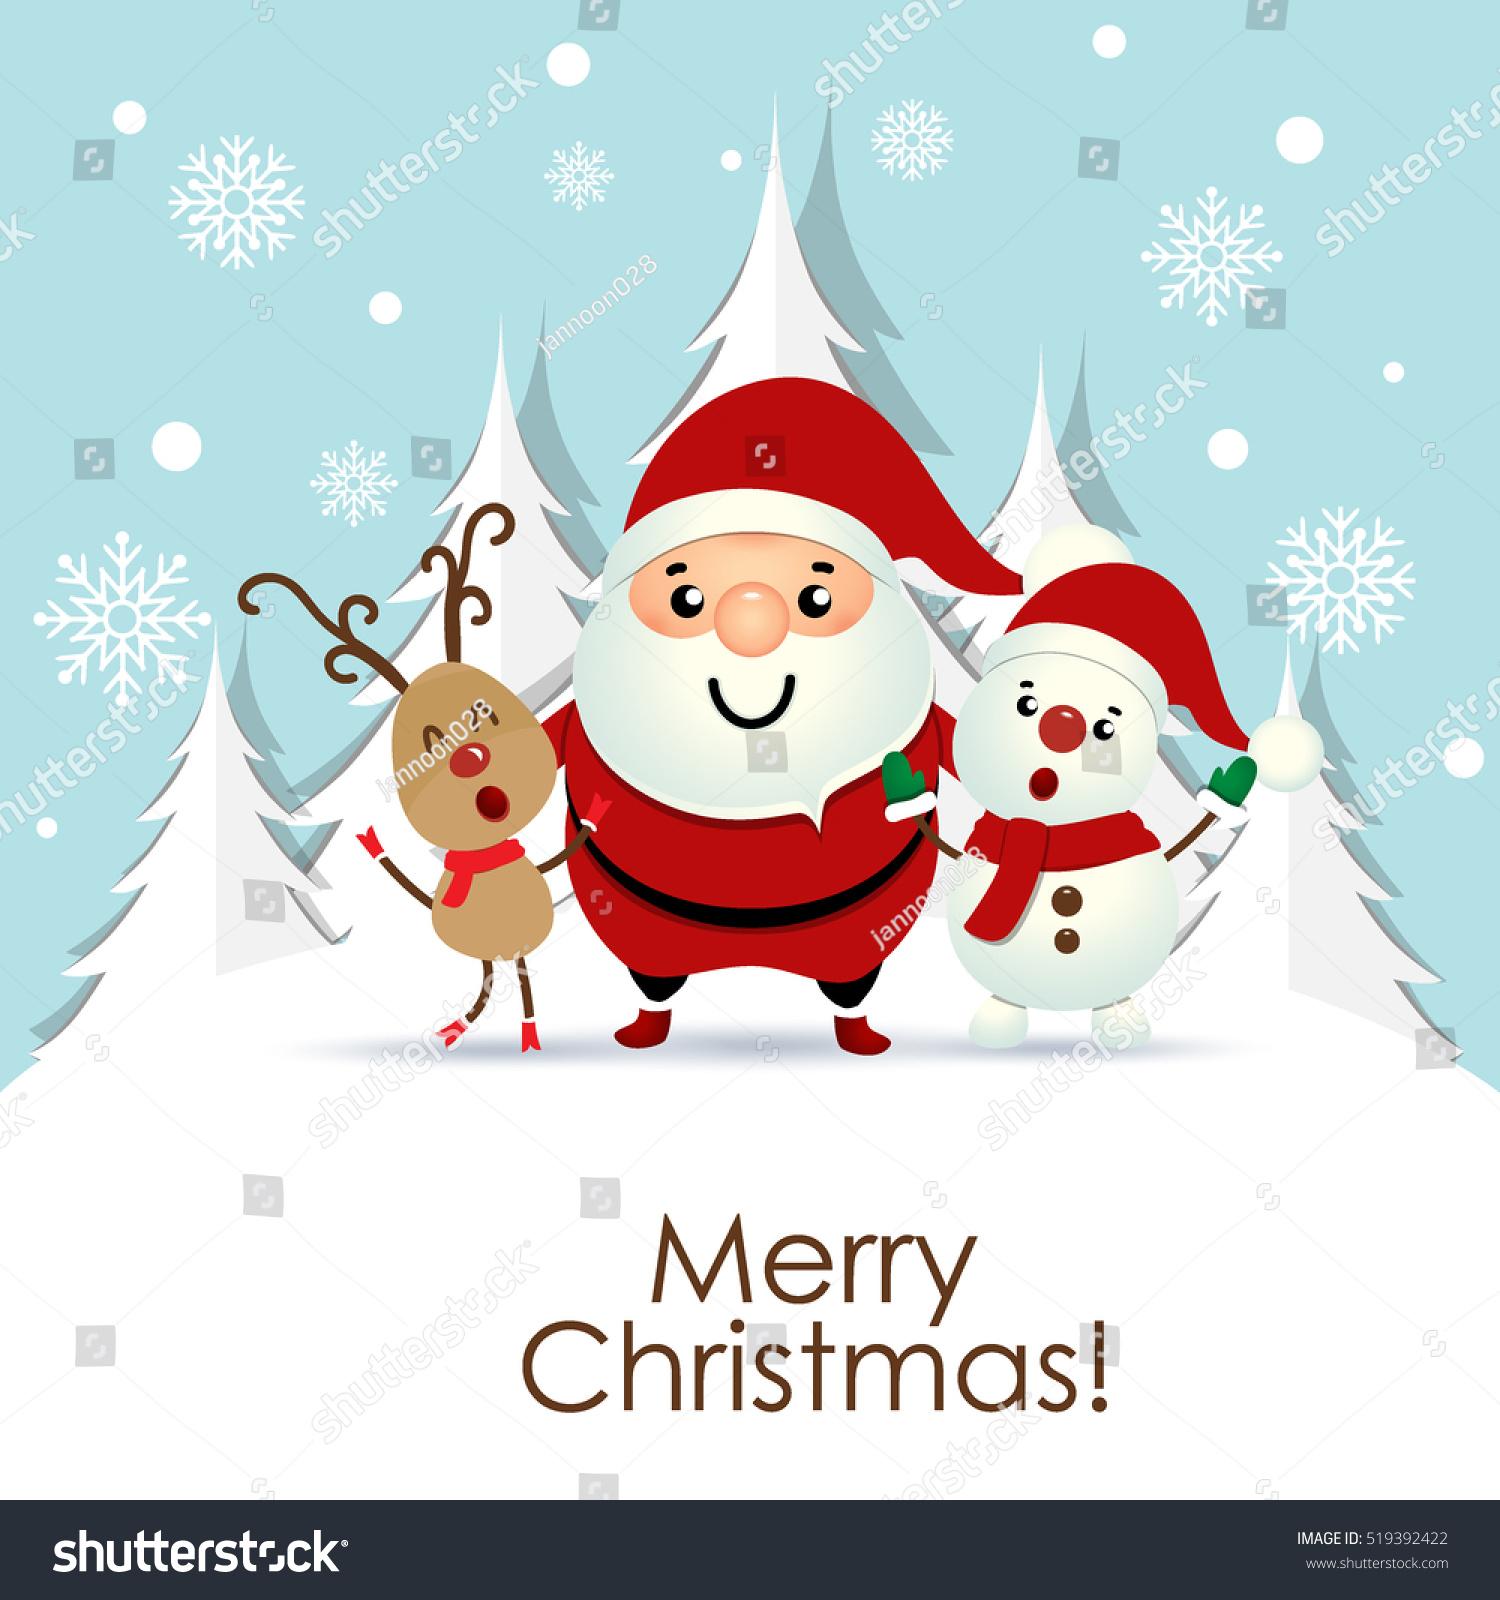 Similar Images Stock Photos Vectors Of Christmas Greeting Card